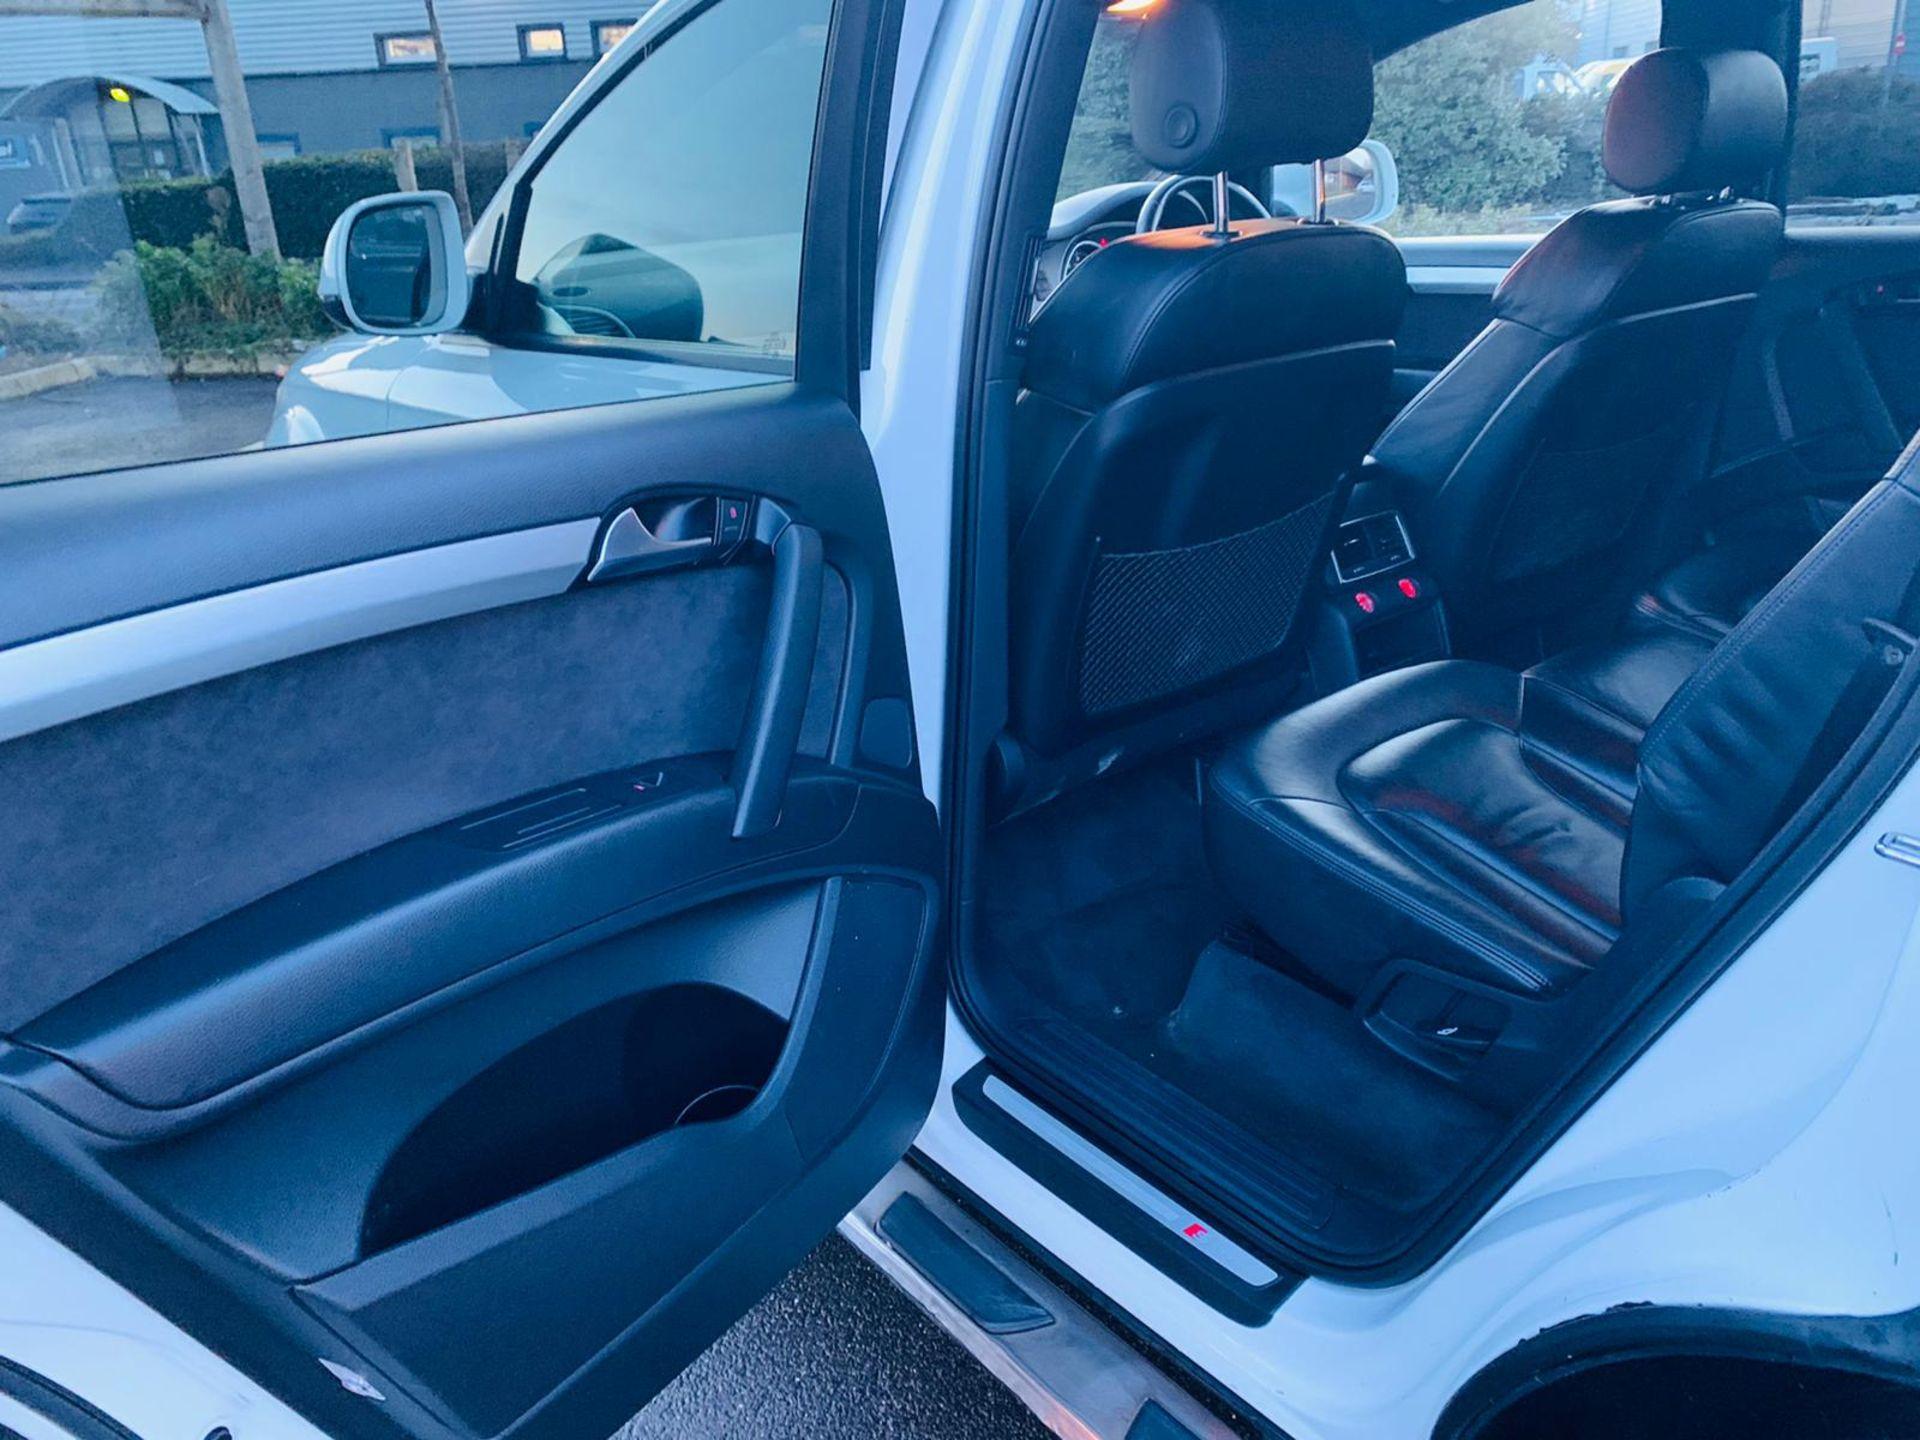 (Reserve Met)Audi Q7 3.0 TDI Quattro S Line Plus Auto (7 Seats) - 12 Reg - Only 63k Miles -Sat Nav- - Image 32 of 37